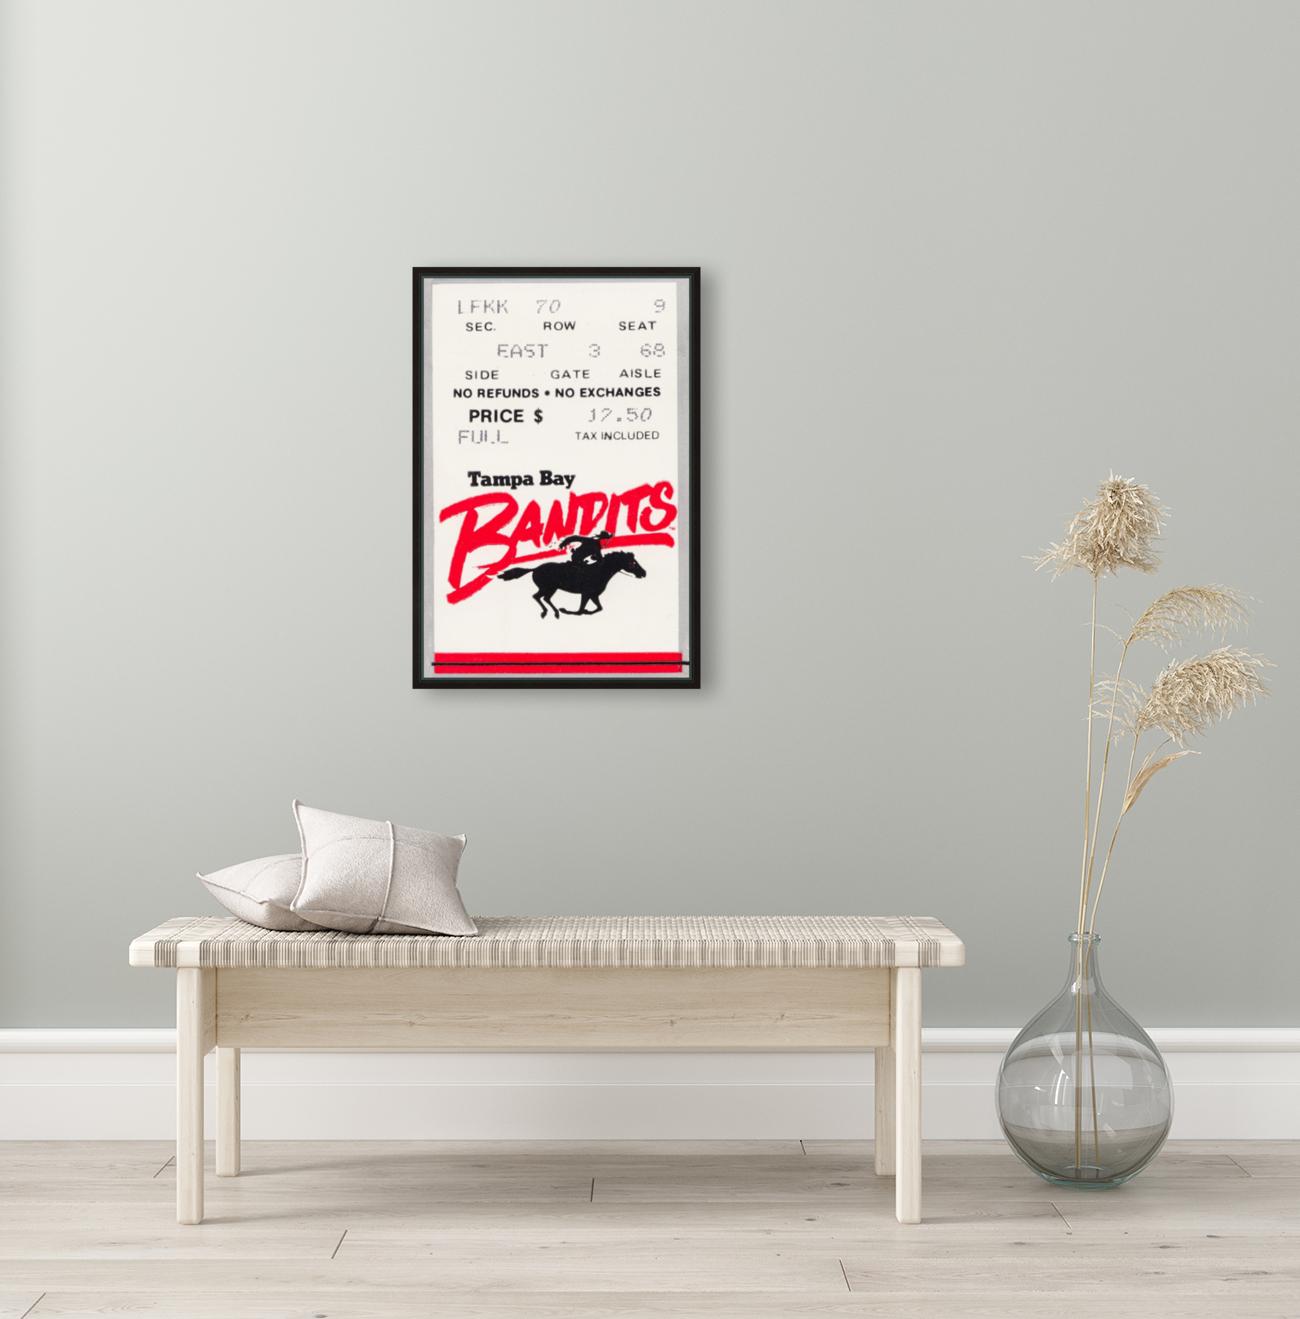 1985 Tampa Bay Bandits Ticket Stub Art  Art